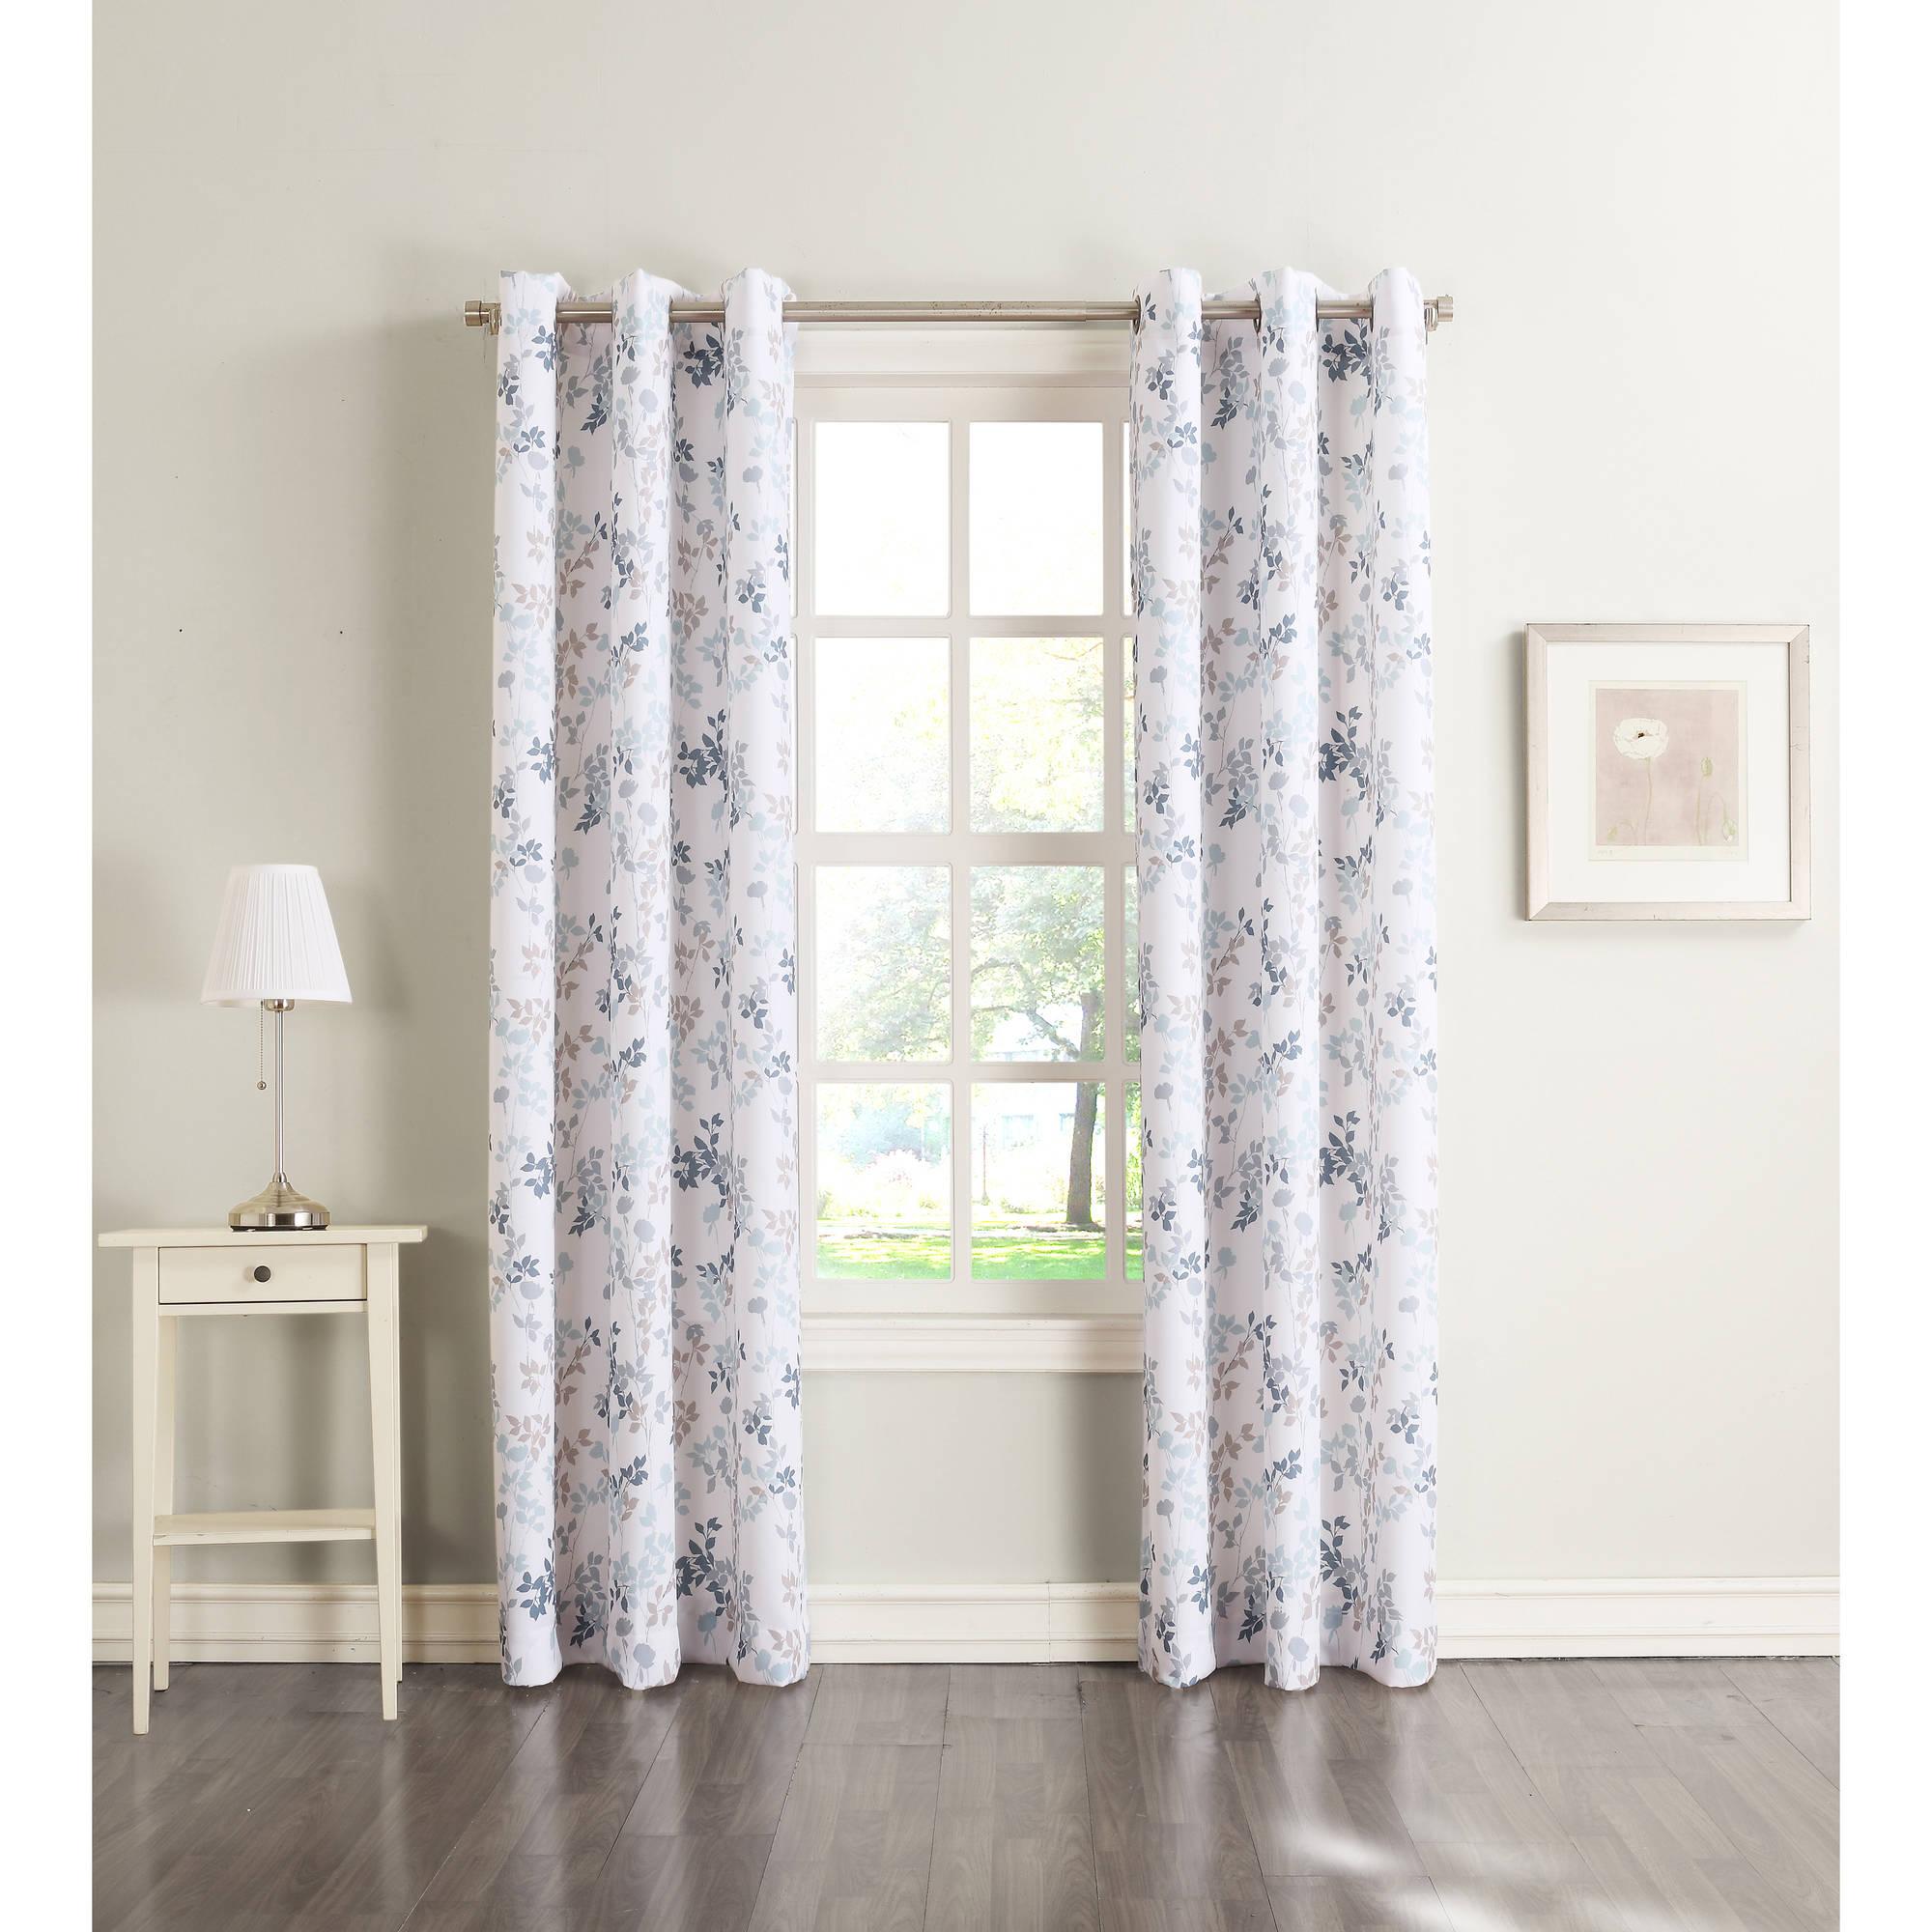 918 Mabel Casual Grommet Curtain Panel   Walmart.com